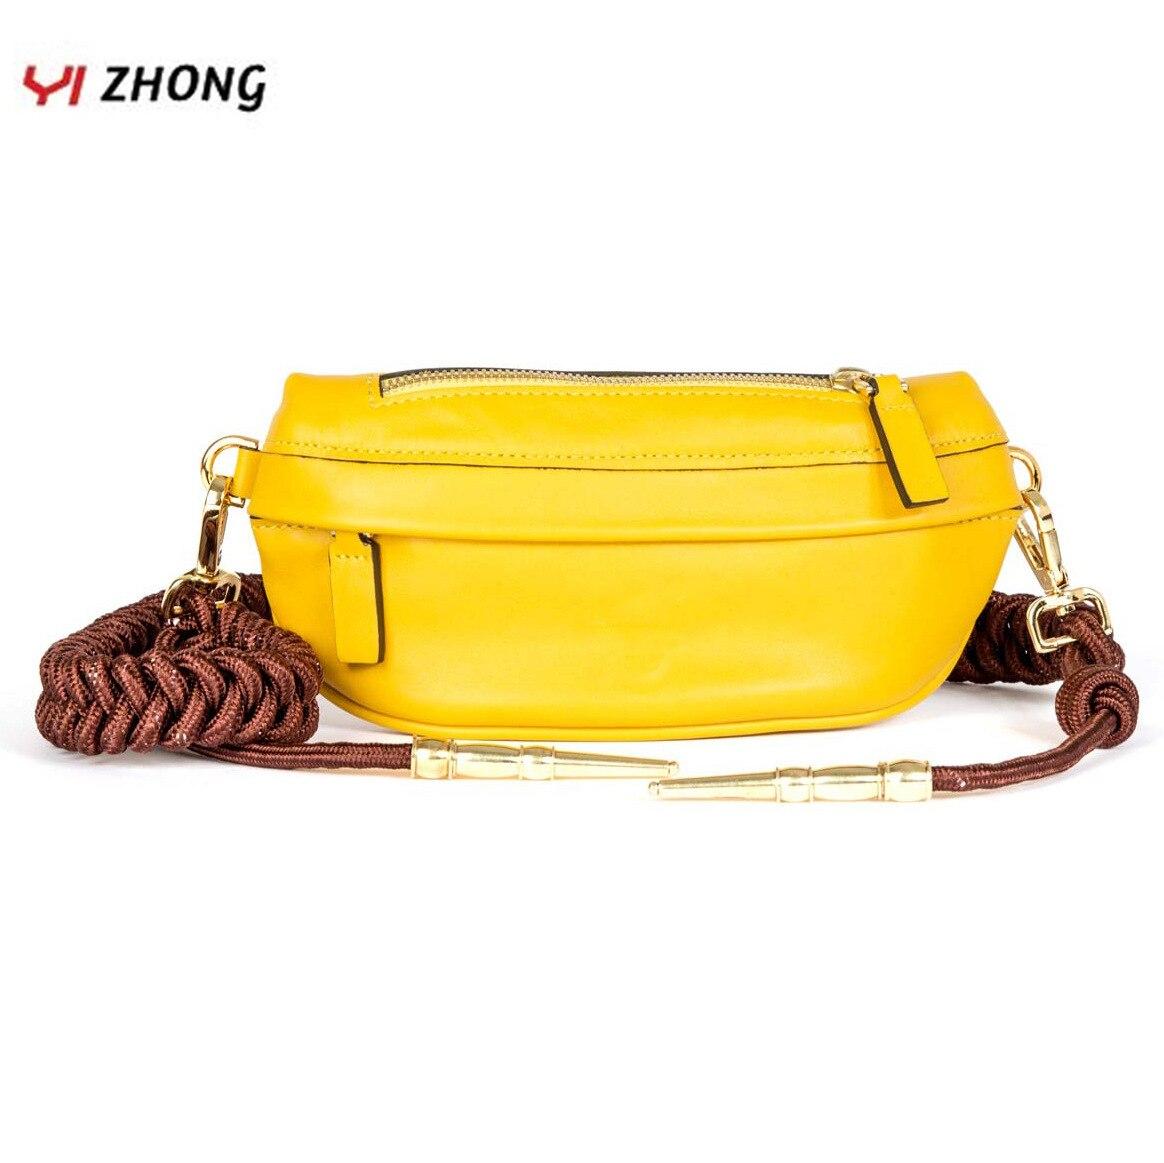 YIZHONG Braided Knot Waist Bag Luxury Designer Chest Bag  Leather Women Fanny Packs Fashion Belt Bag Crossbody For Women